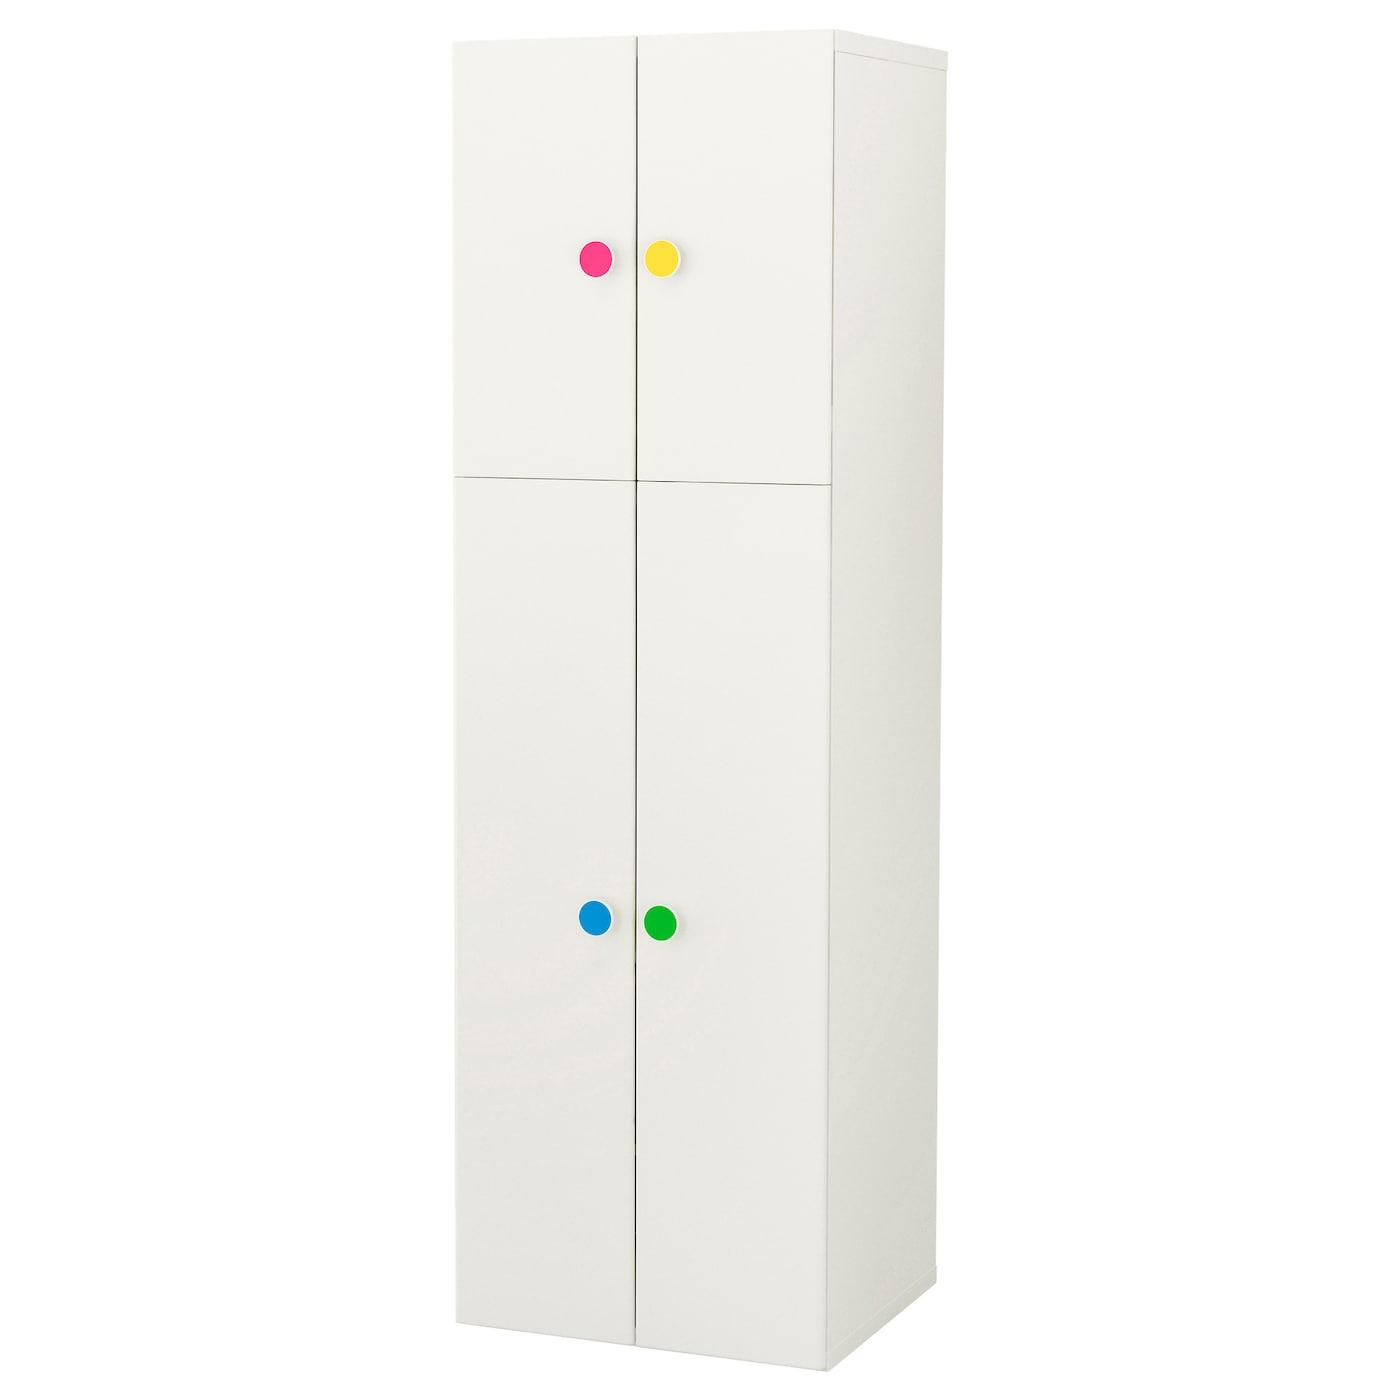 Stuva f lja armoire penderie 4 portes blanc 60x50x192 cm for Armoire penderie 4 portes